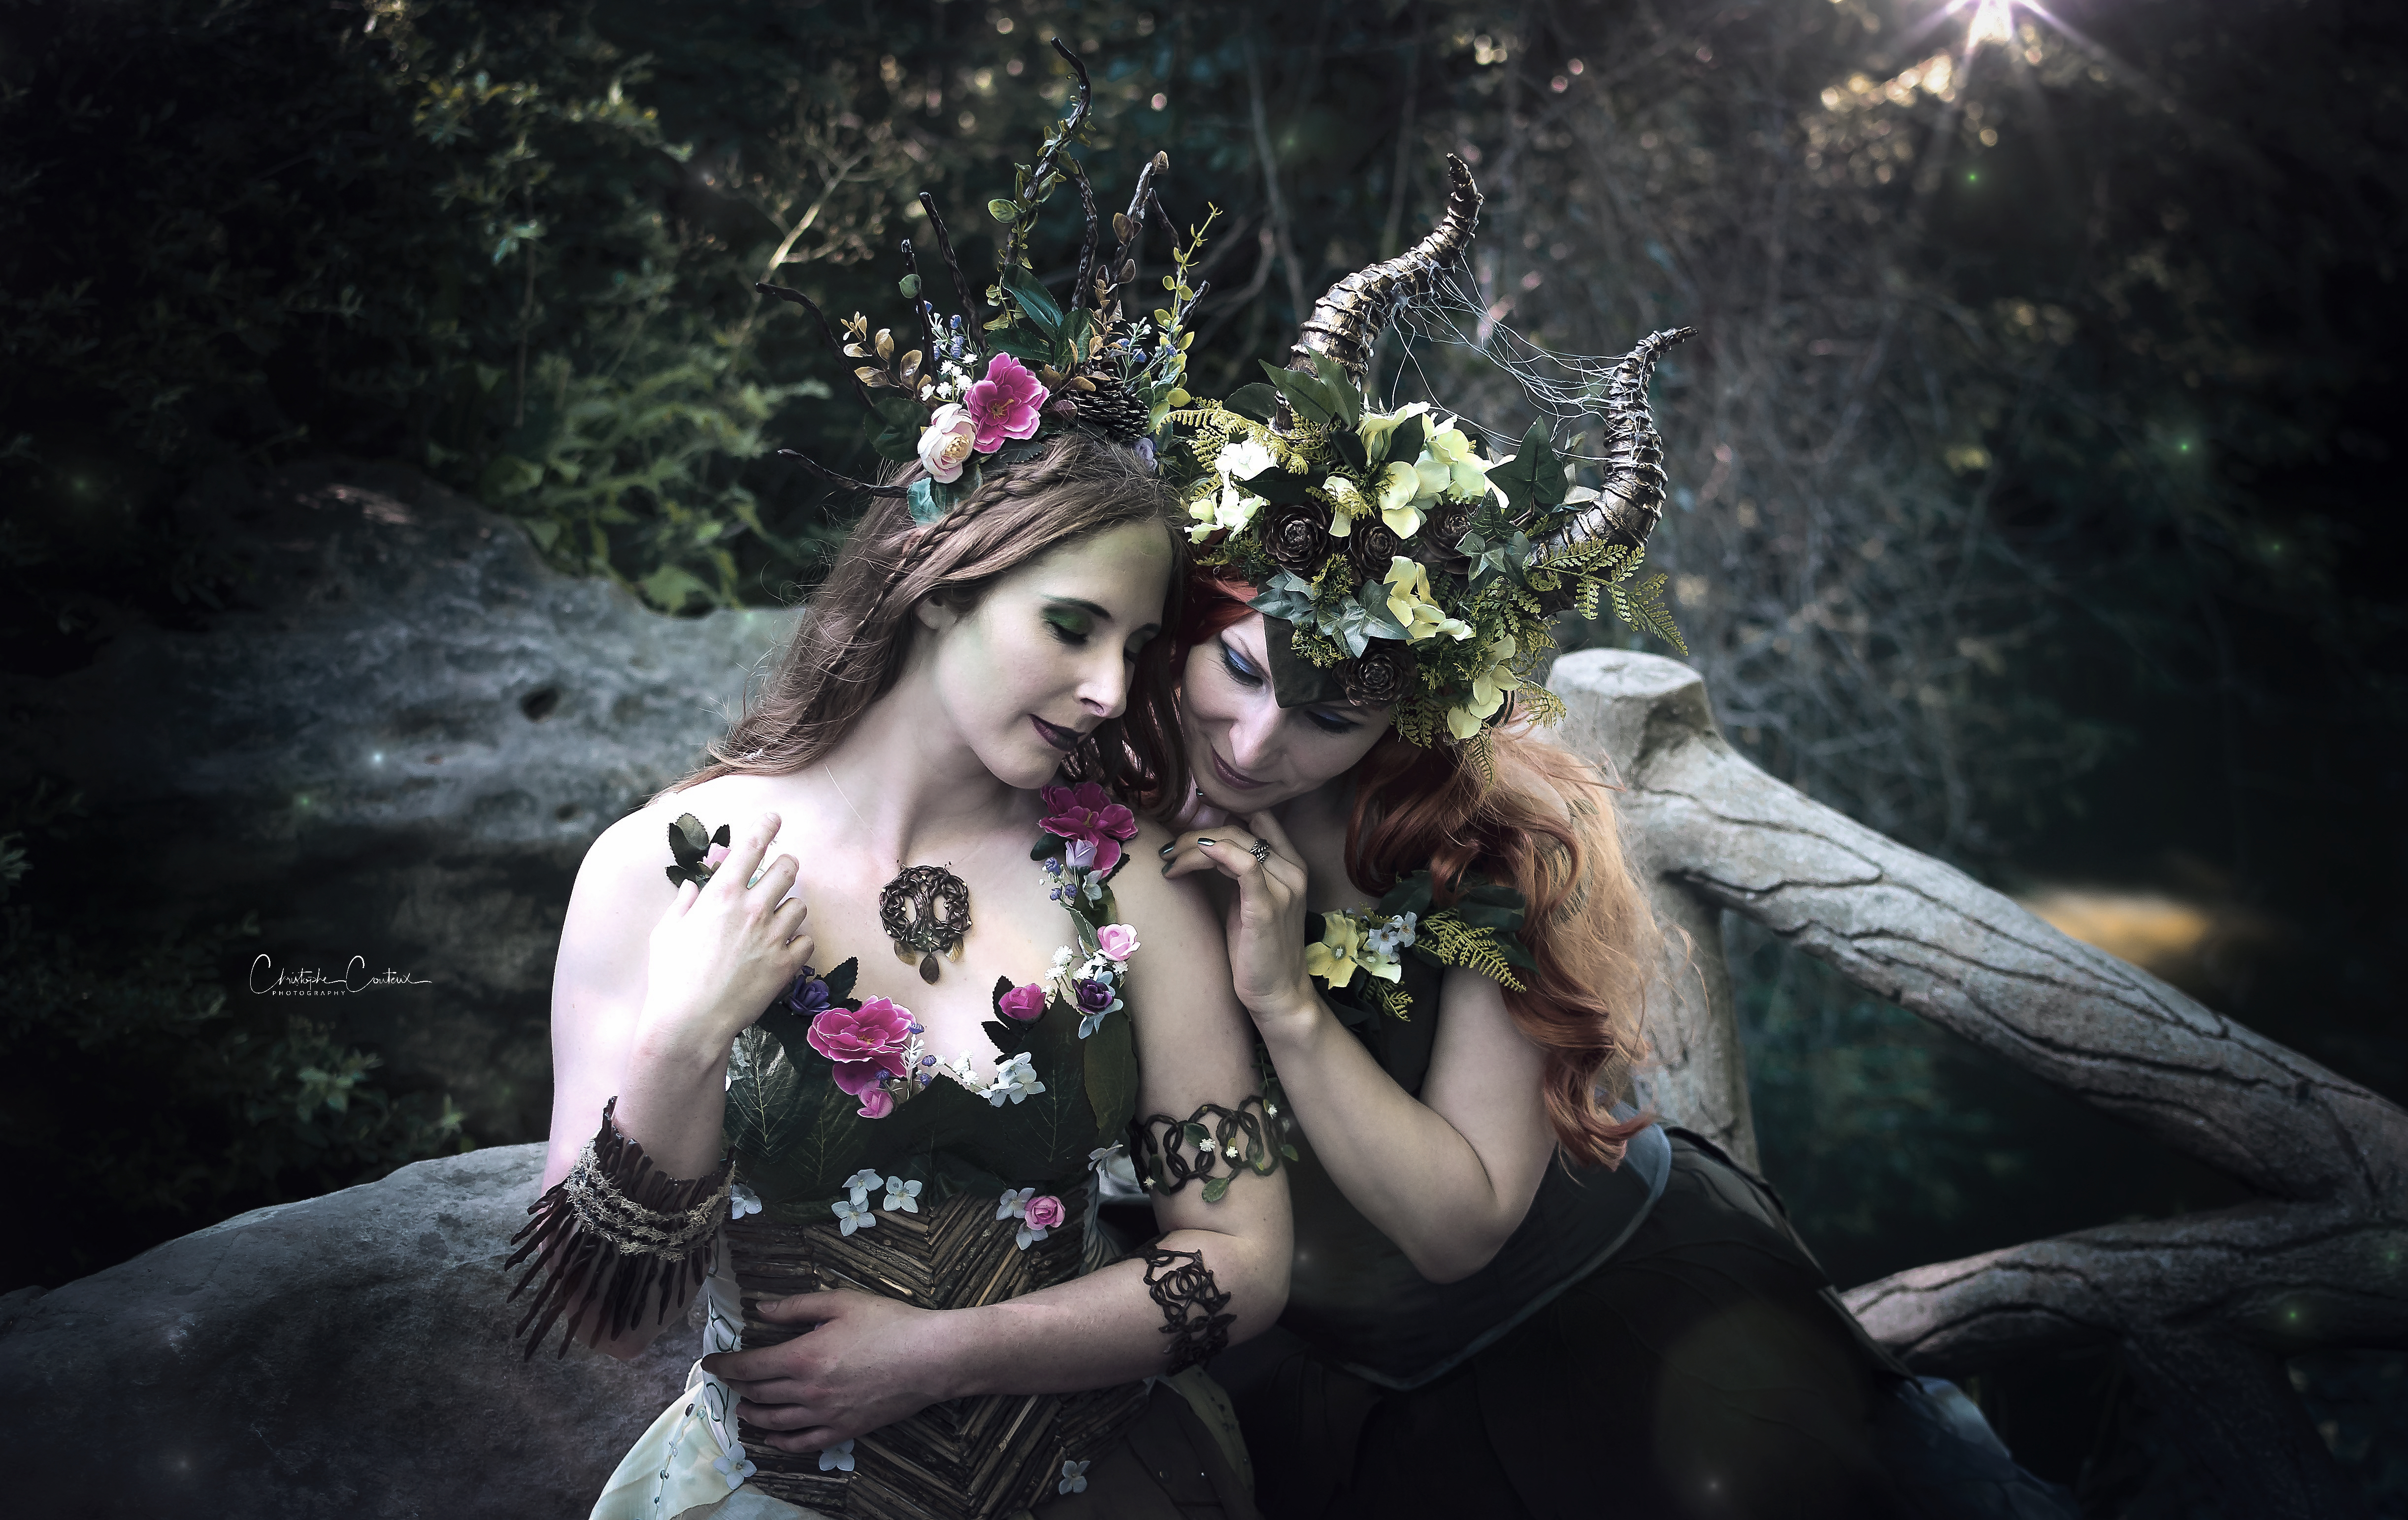 Marion & Kristina